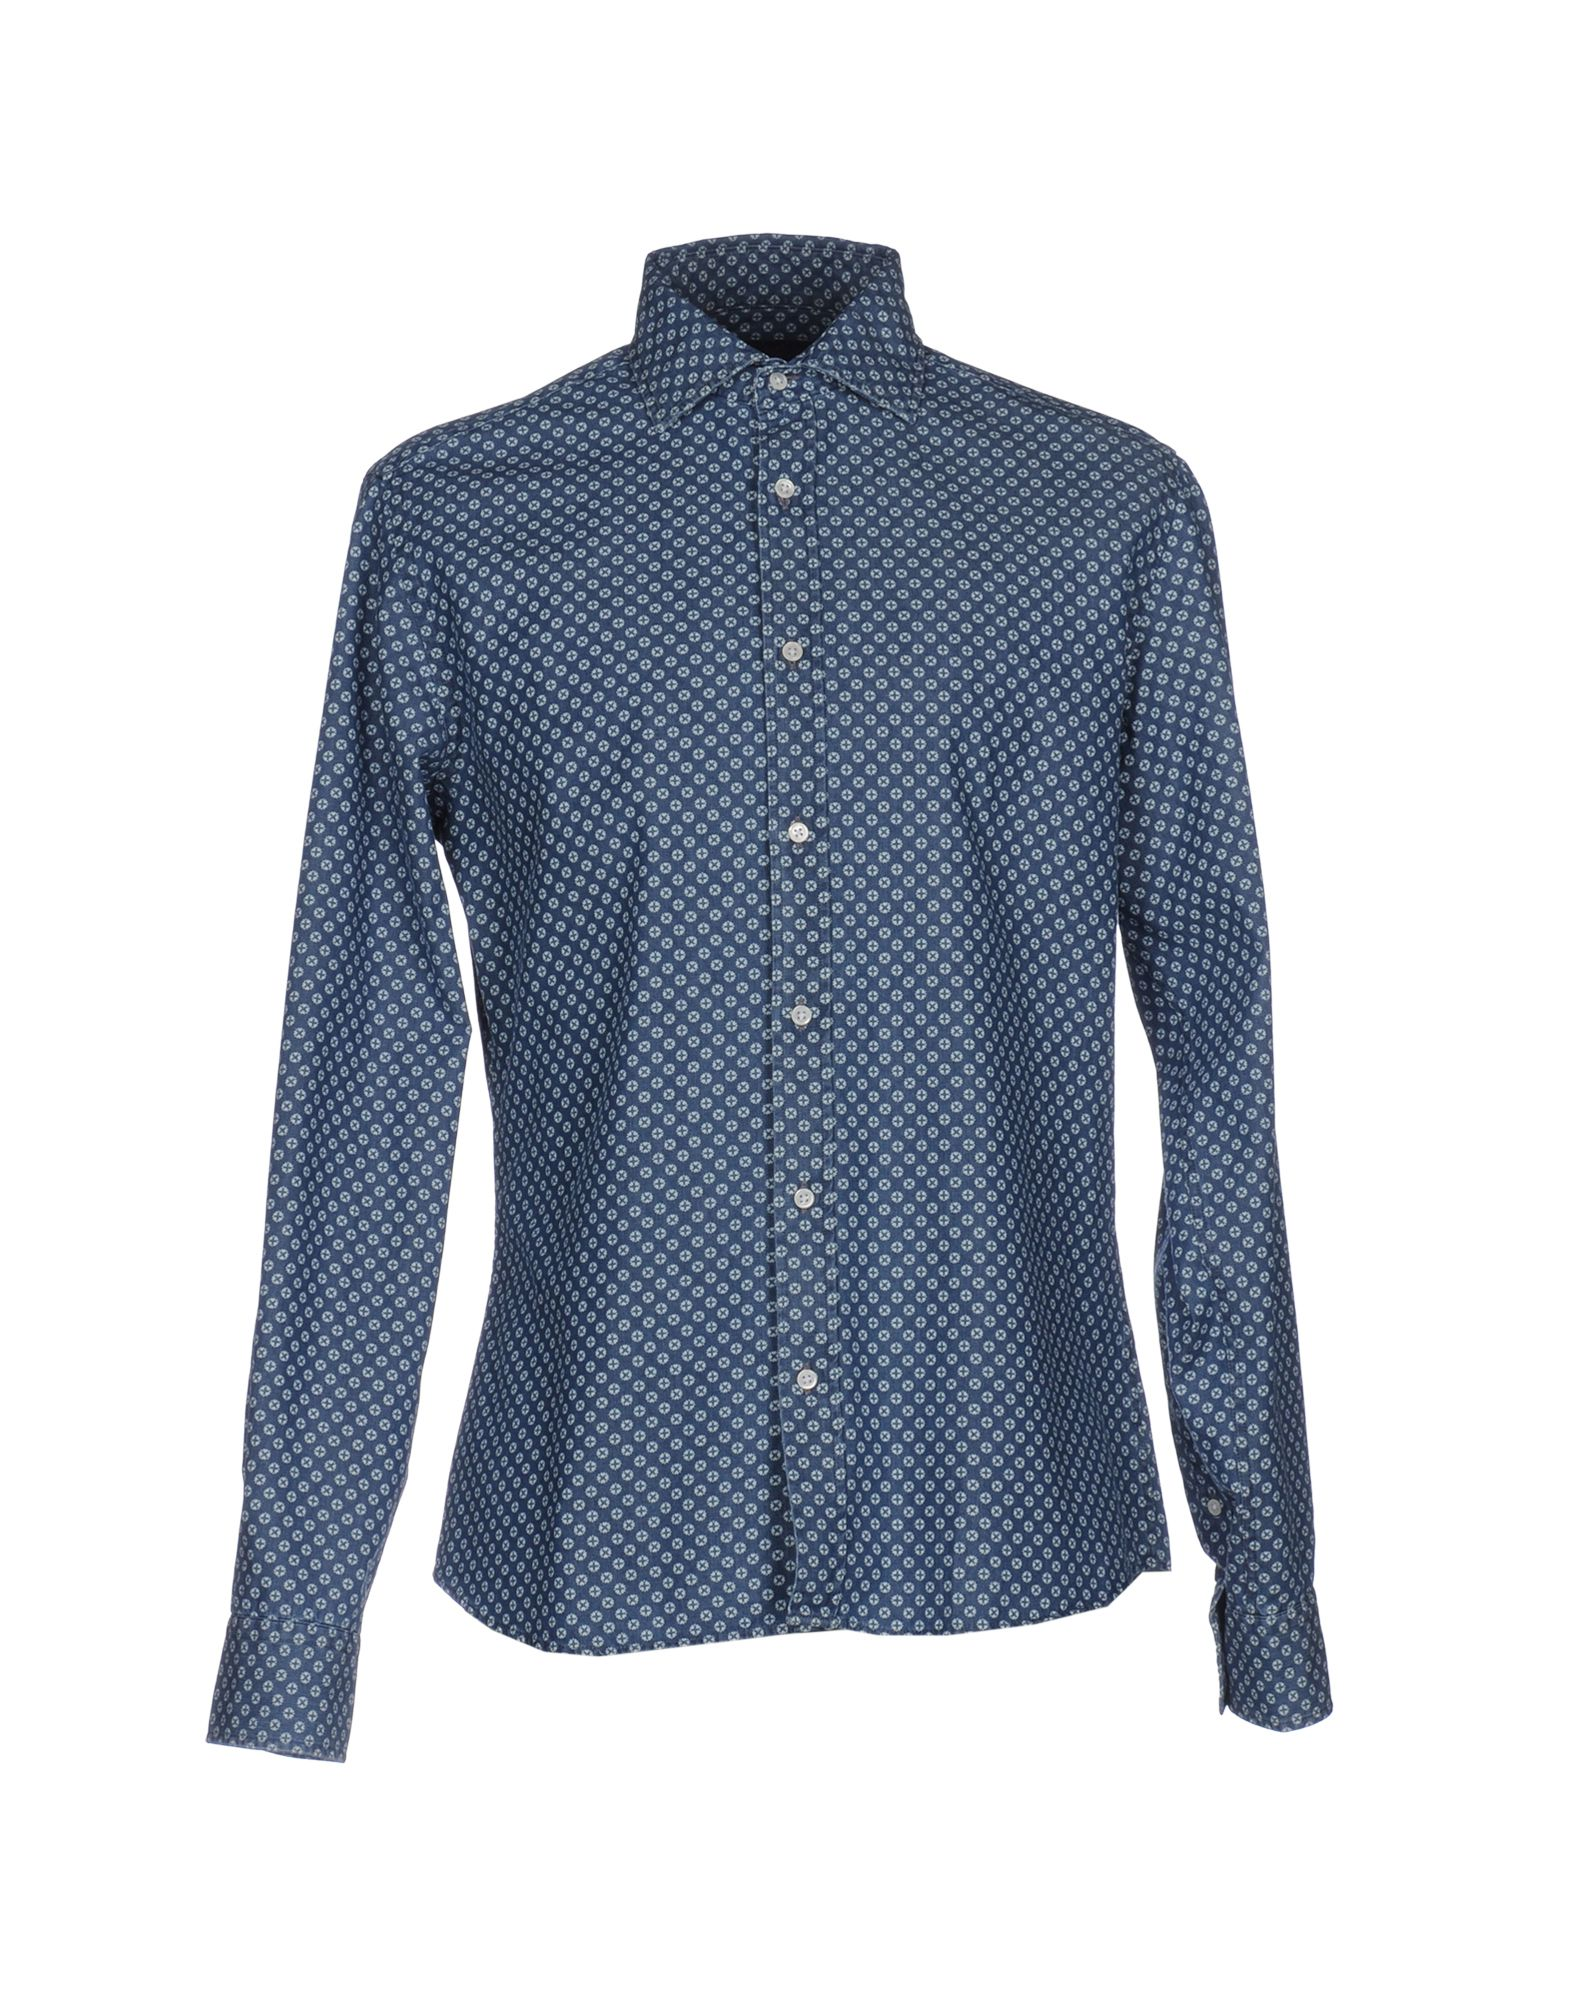 ALTEA dal 1973 Джинсовая рубашка altea dal 1973 джинсовая рубашка